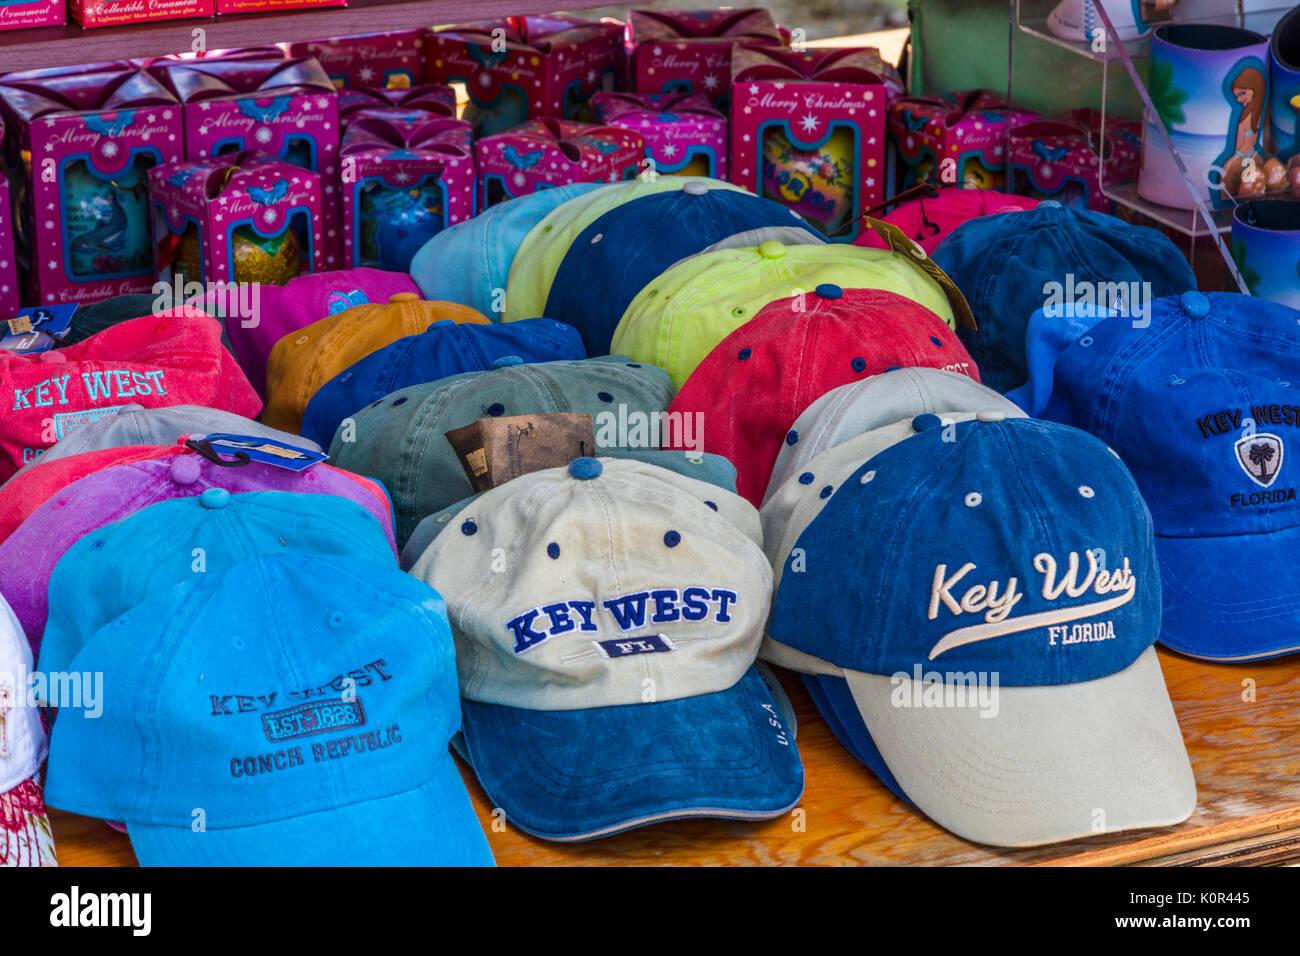 Baseball caps in Key West Florida - Stock Image